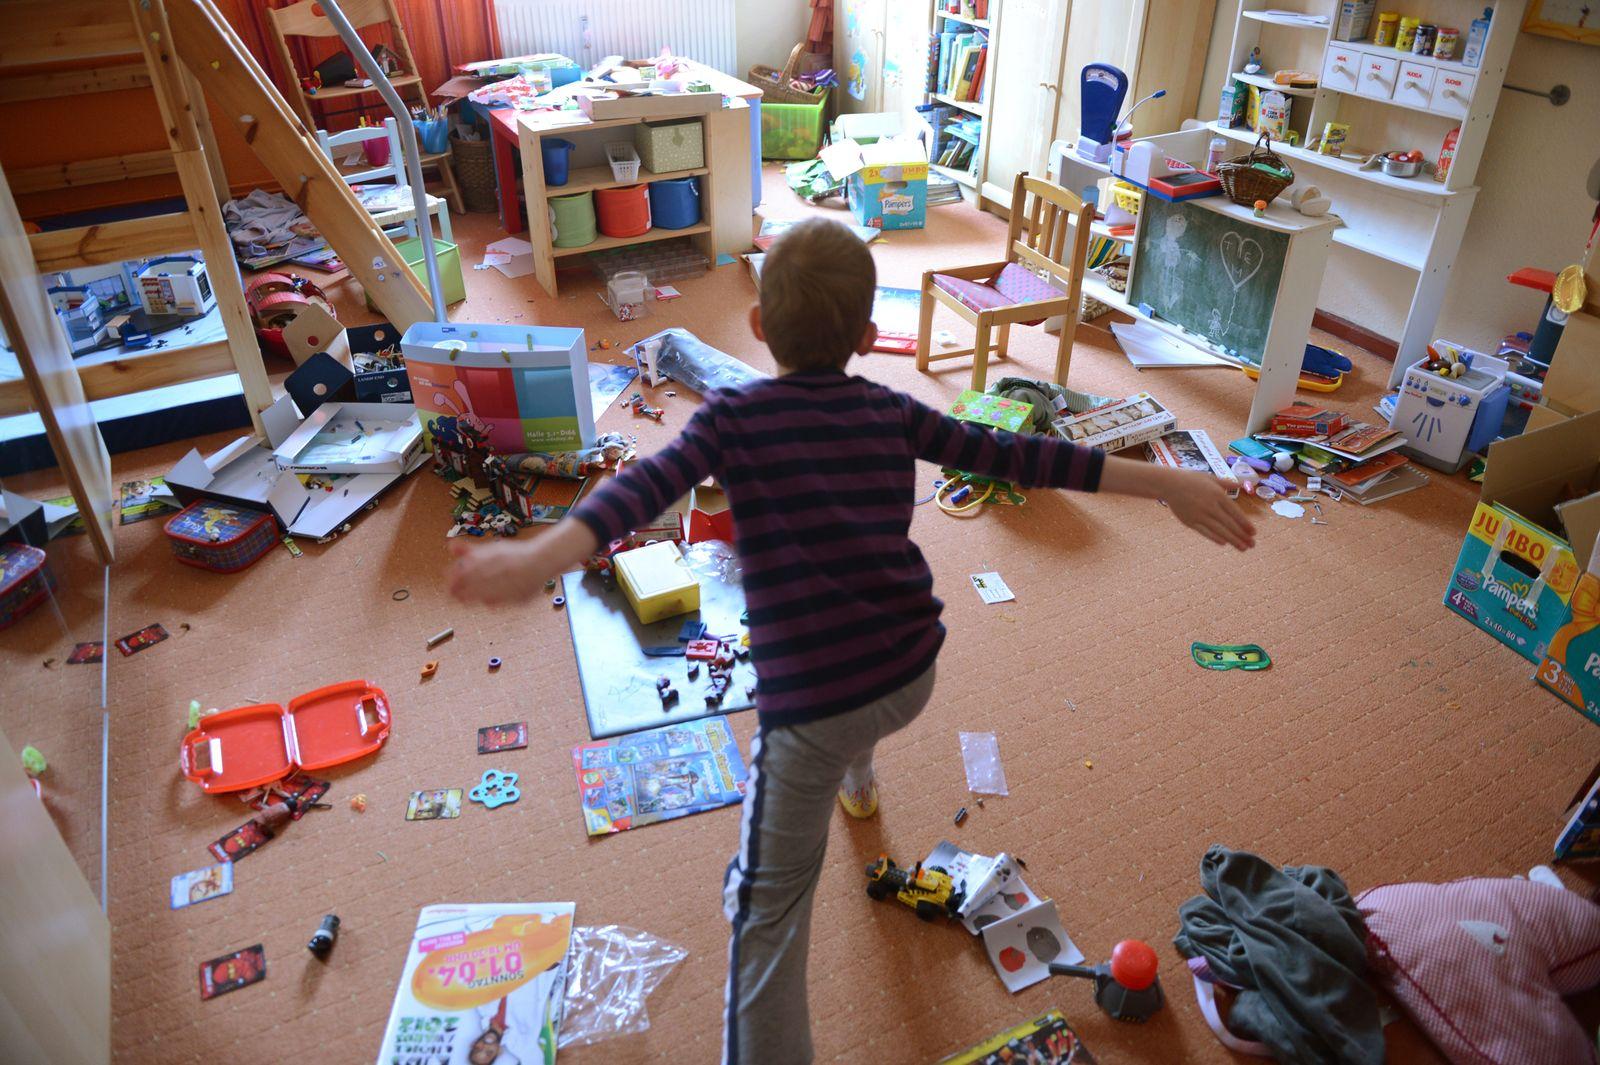 Kinderzimmer/ Spielzeug